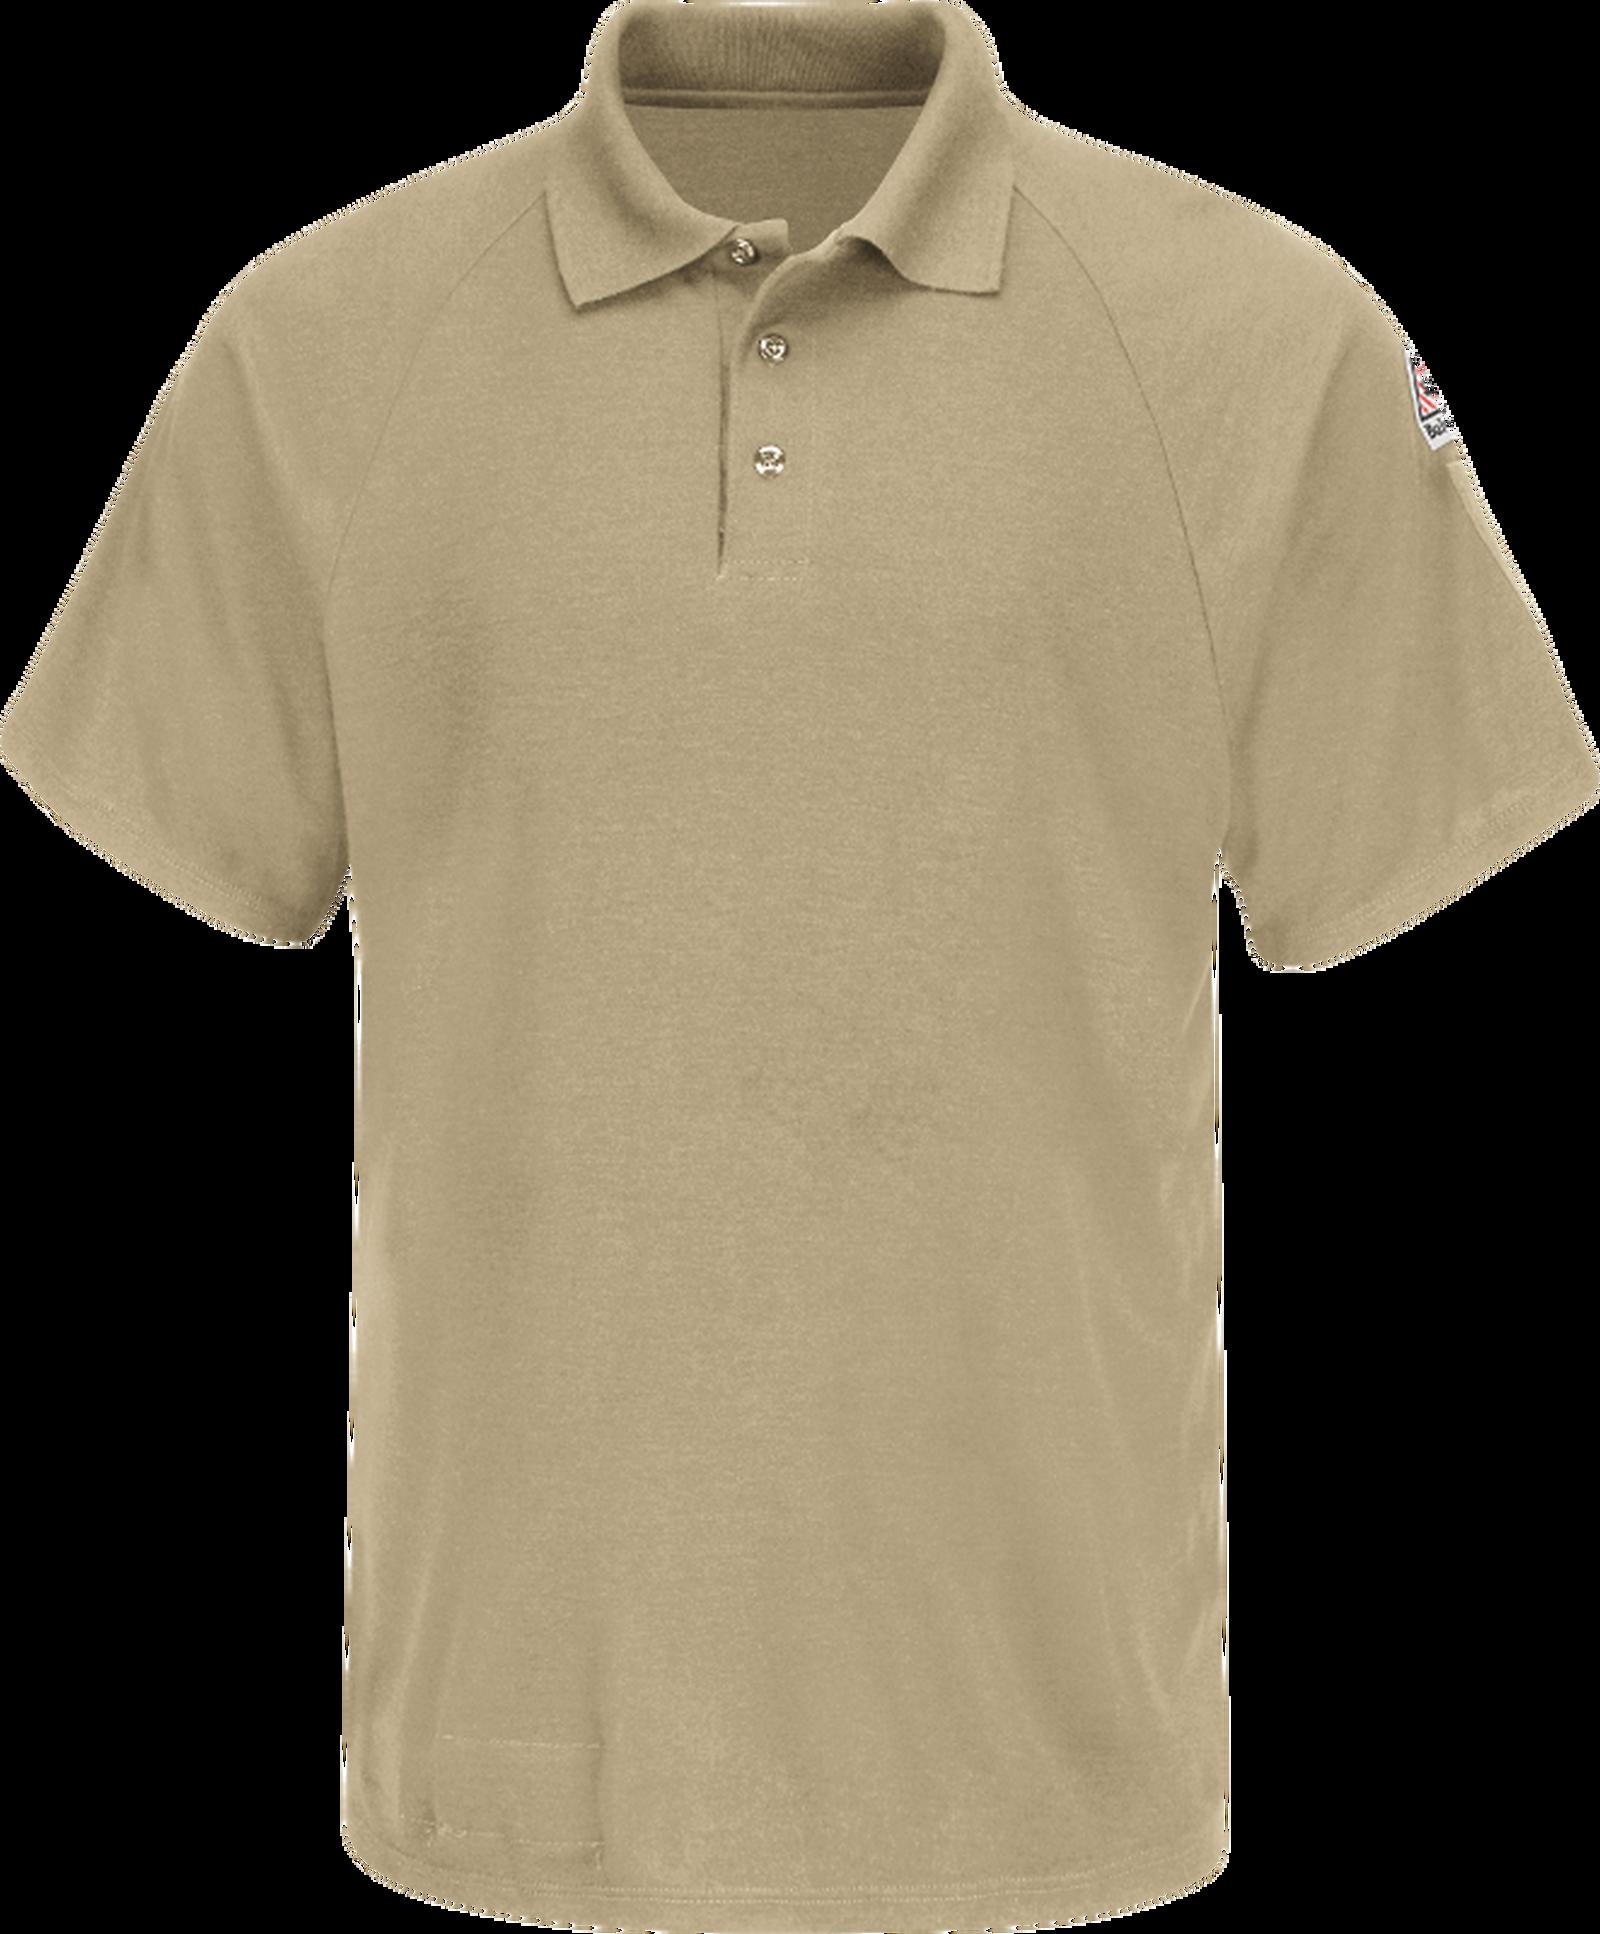 Men's Classic Lightweight FR Short Sleeve Polo